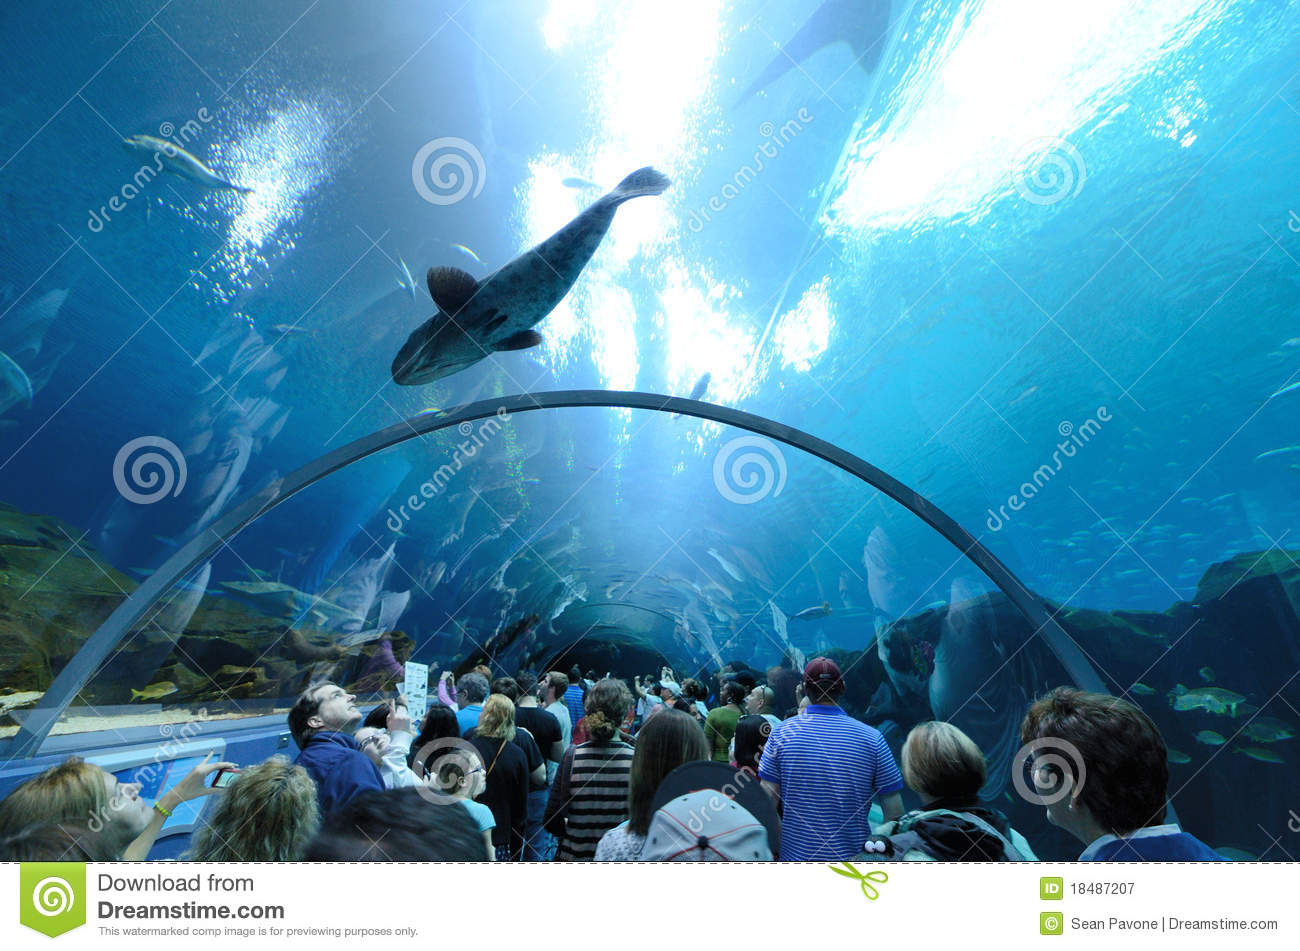 The Georgia Aquarium And Hard Rock Cafe In Downtown Atlanta, Ga.